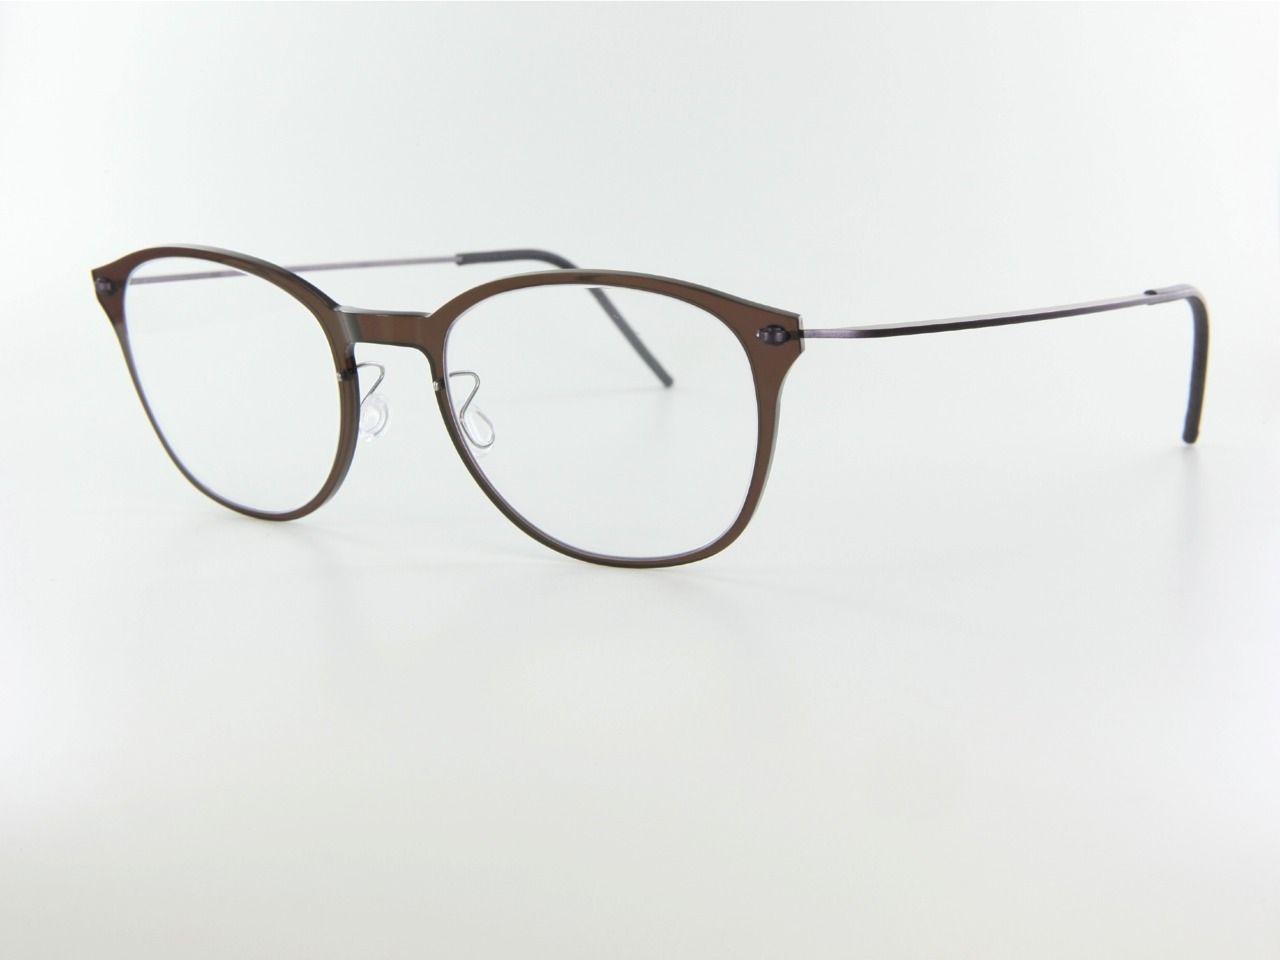 Lindberg   Eyeglass frames   Pinterest   Glass, Eyewear and Nice